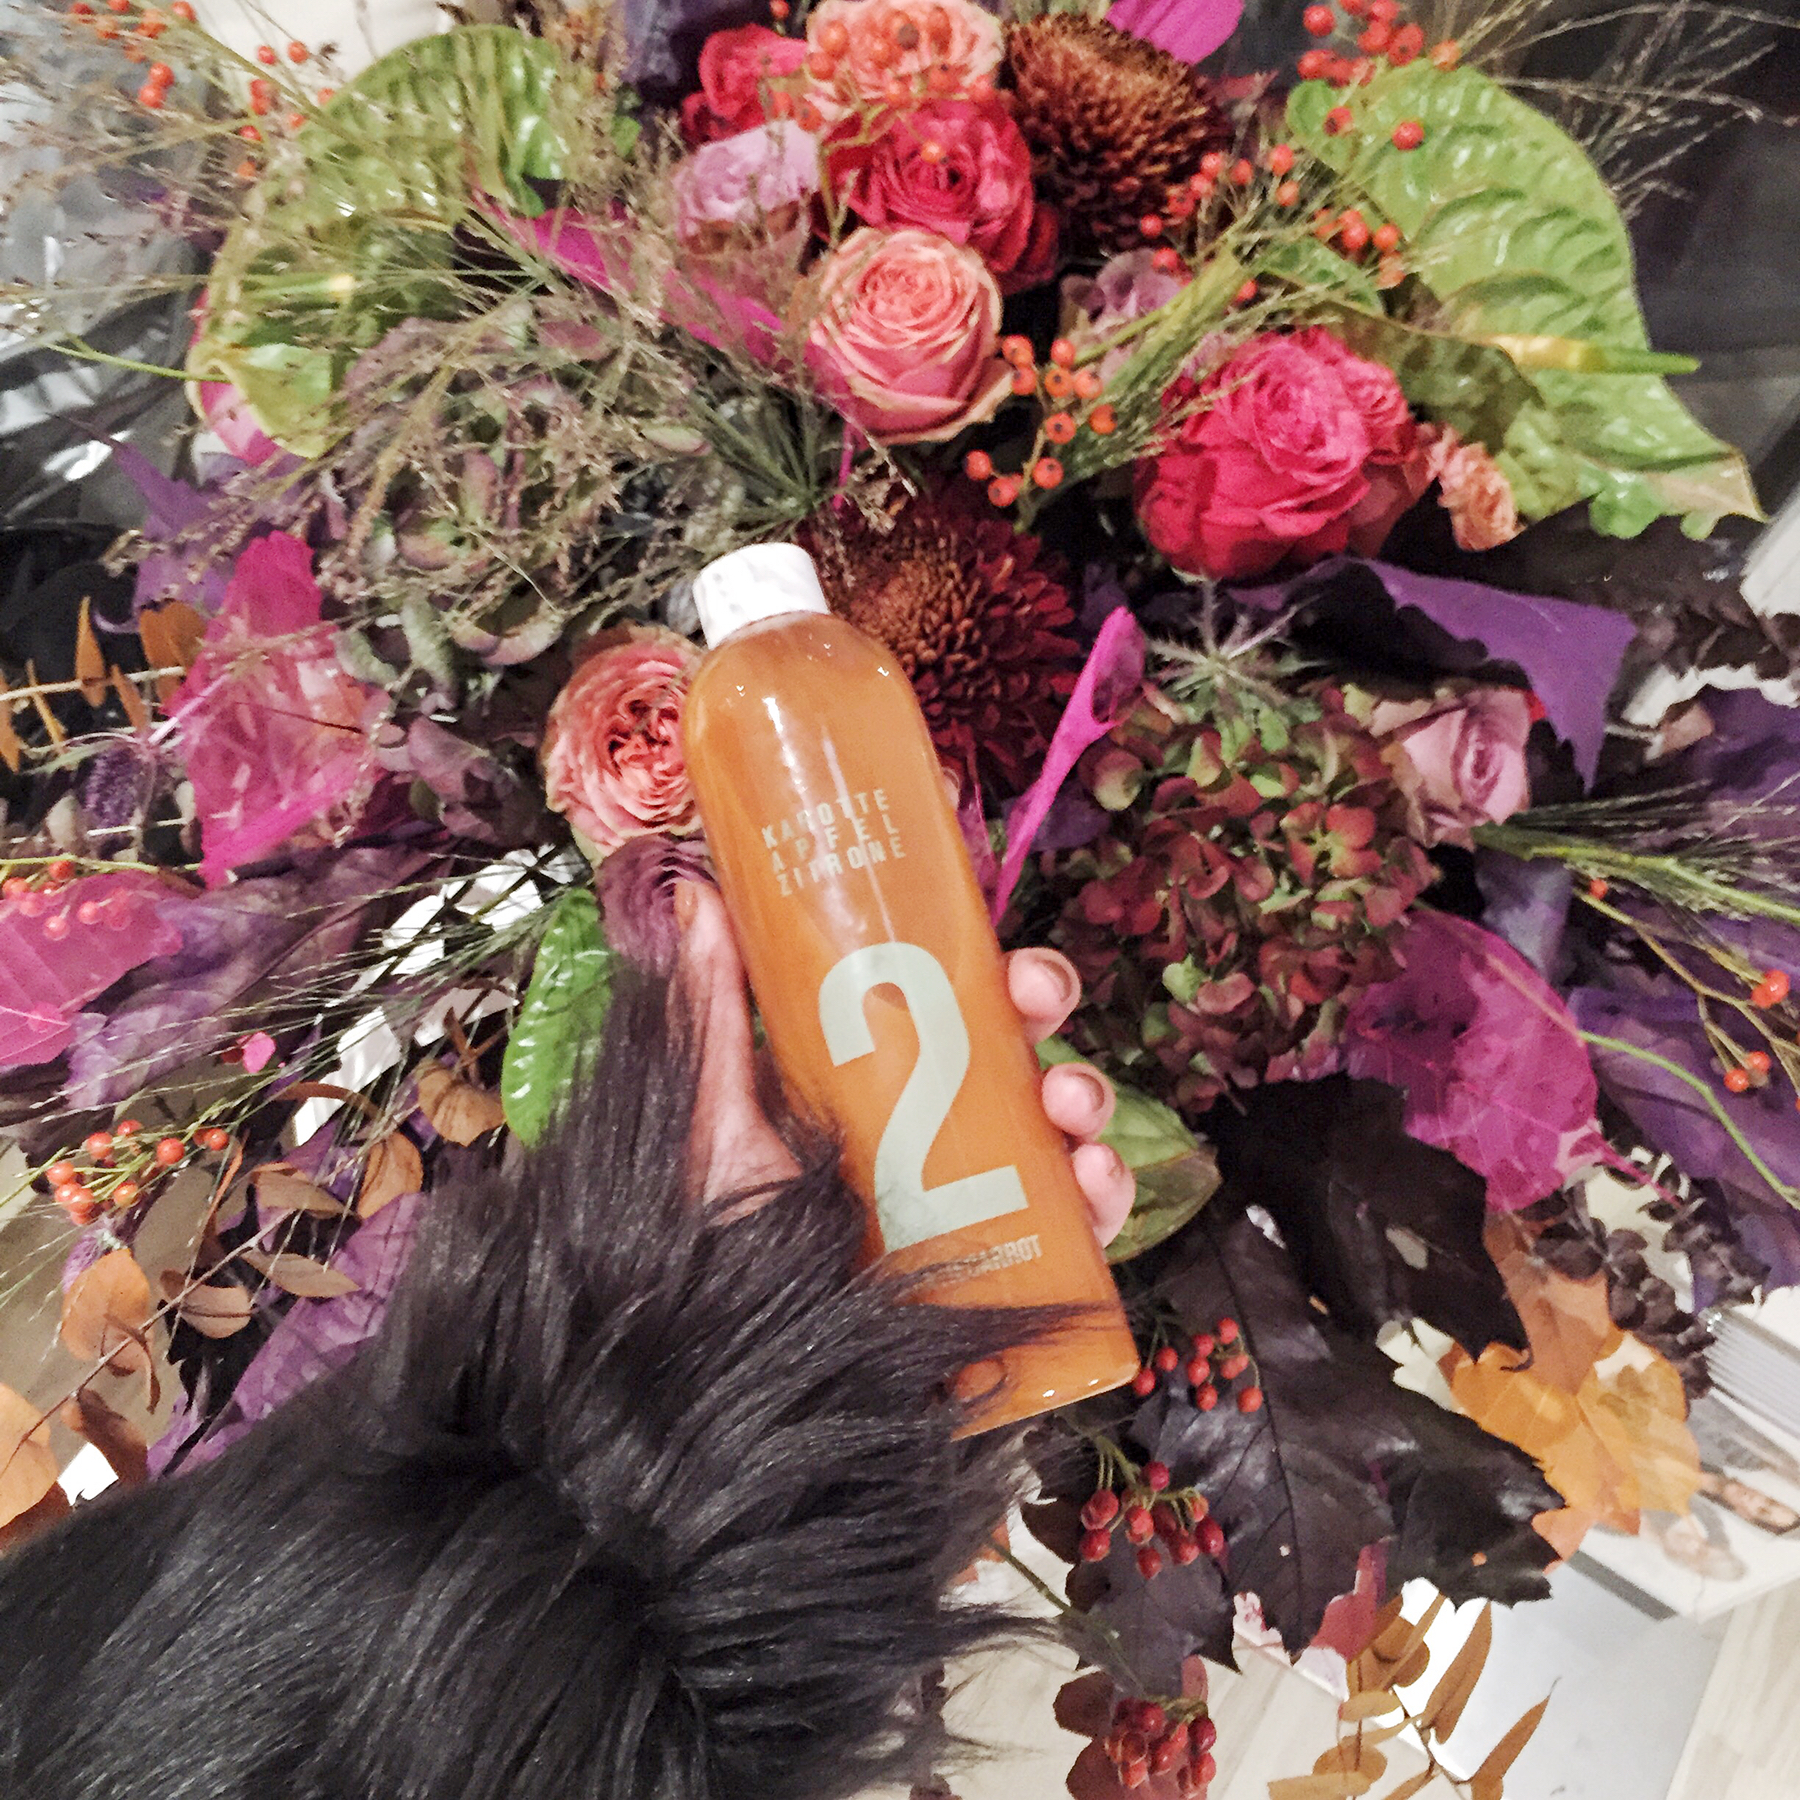 modeblog_hannover_fashionblog_itsgoldie_its_goldie_manou_lenz_elegant_und_excellent